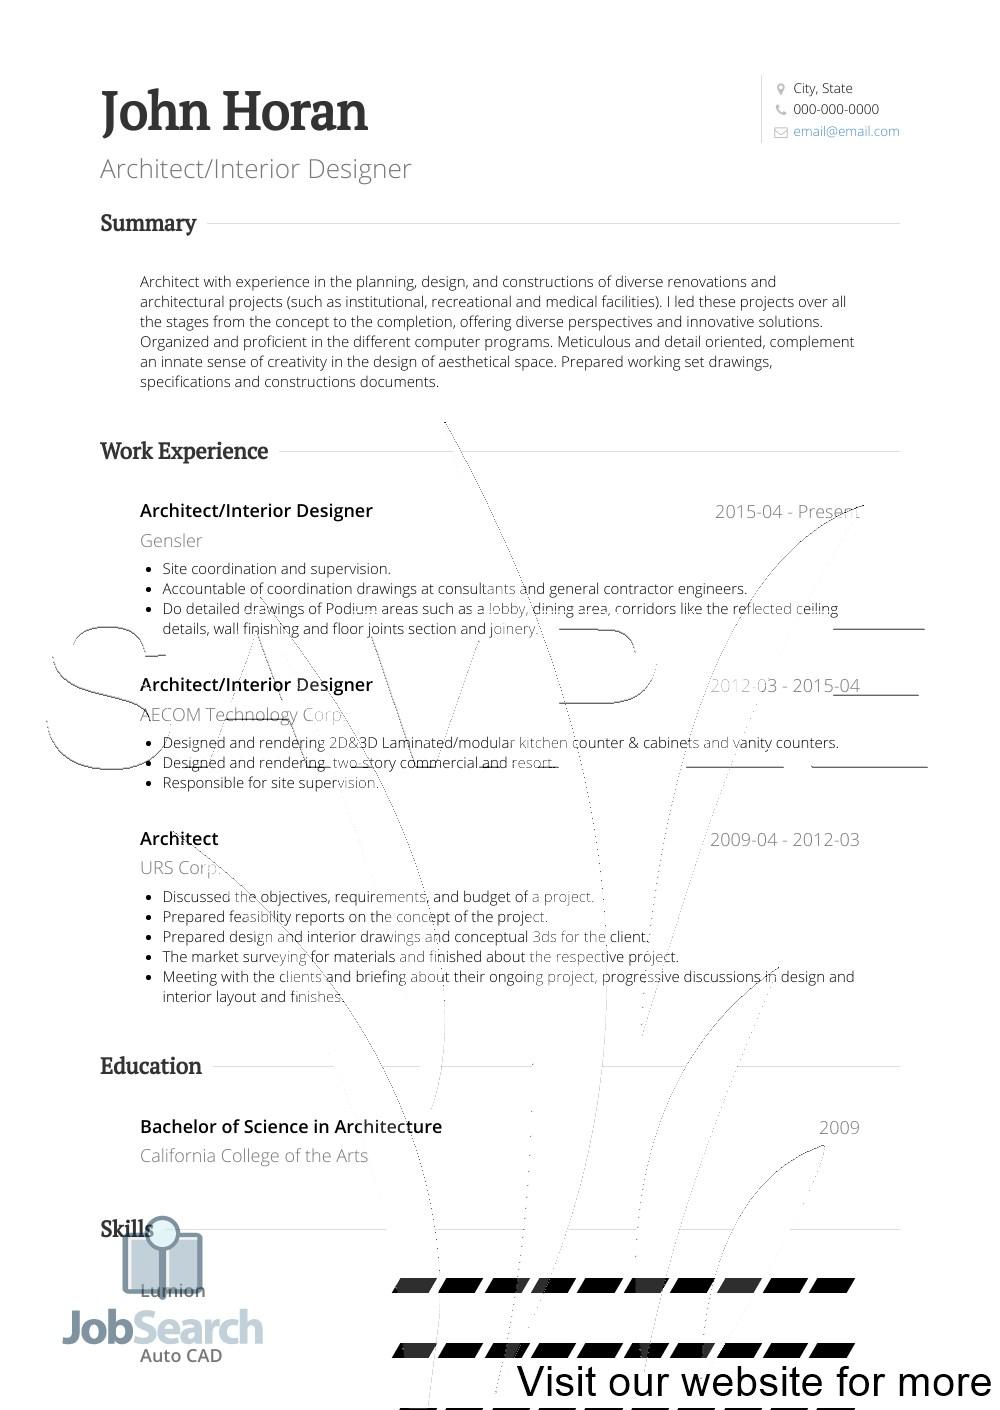 Resume Templates 2020 Australia